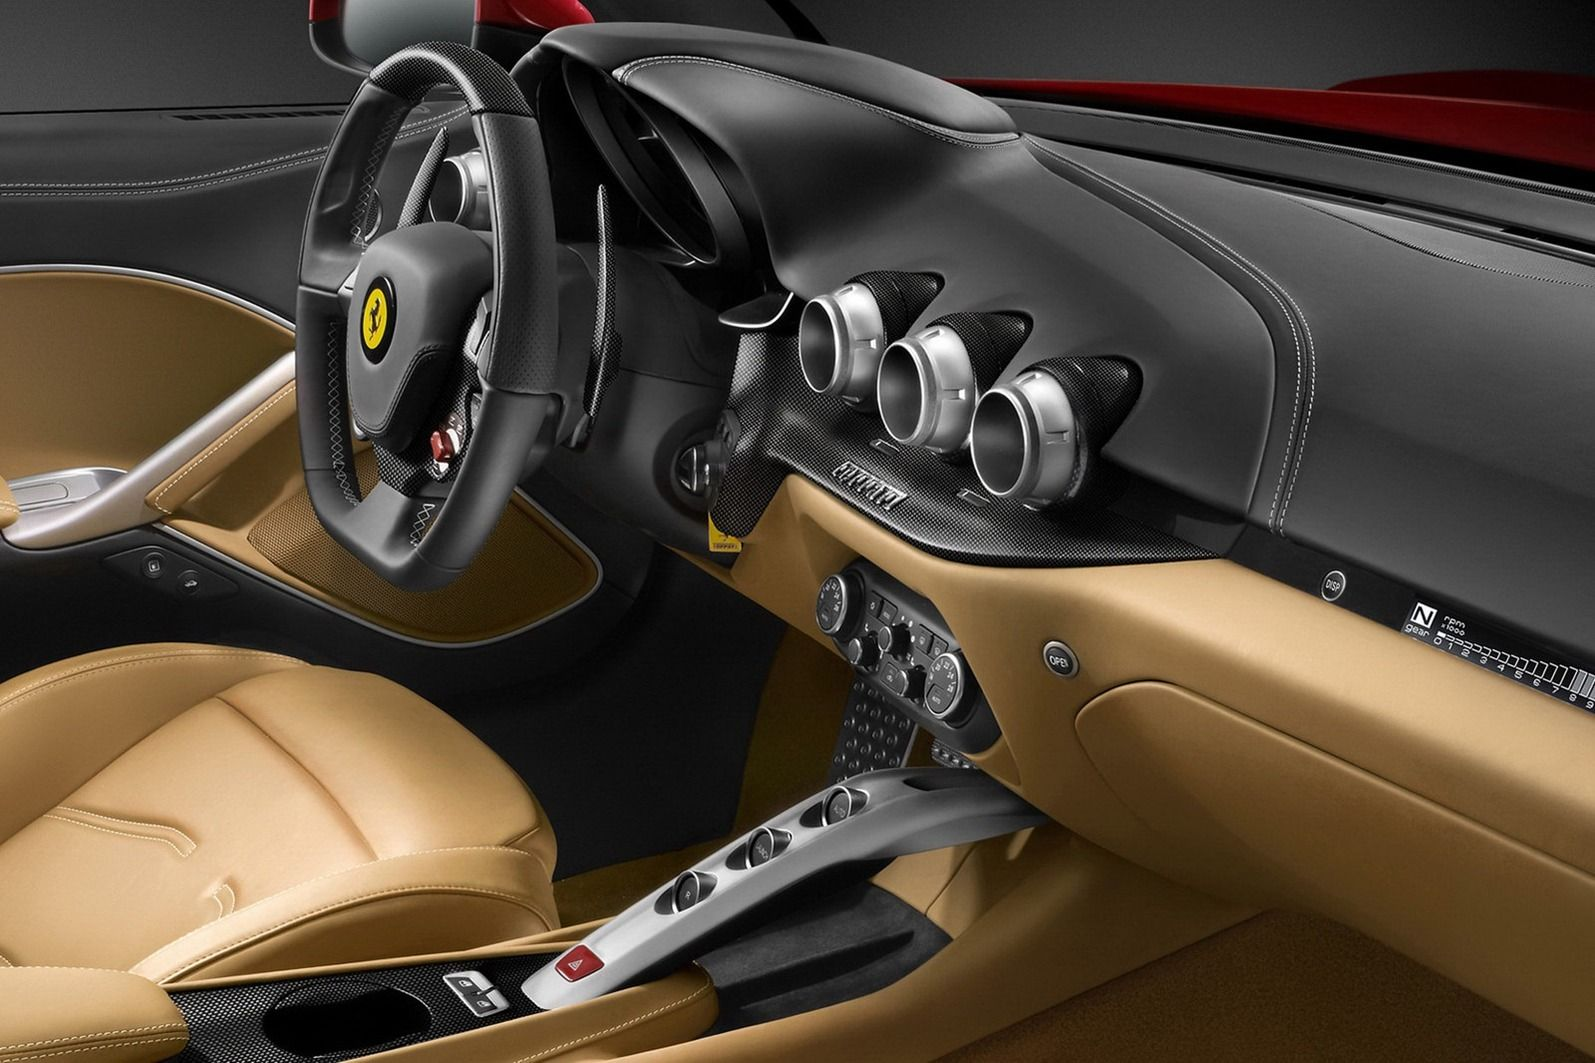 Ferrari F12 Berlinetta Interior Www Fhdailey Com Ferrari F12 Ferrari F12berlinetta Ferrari